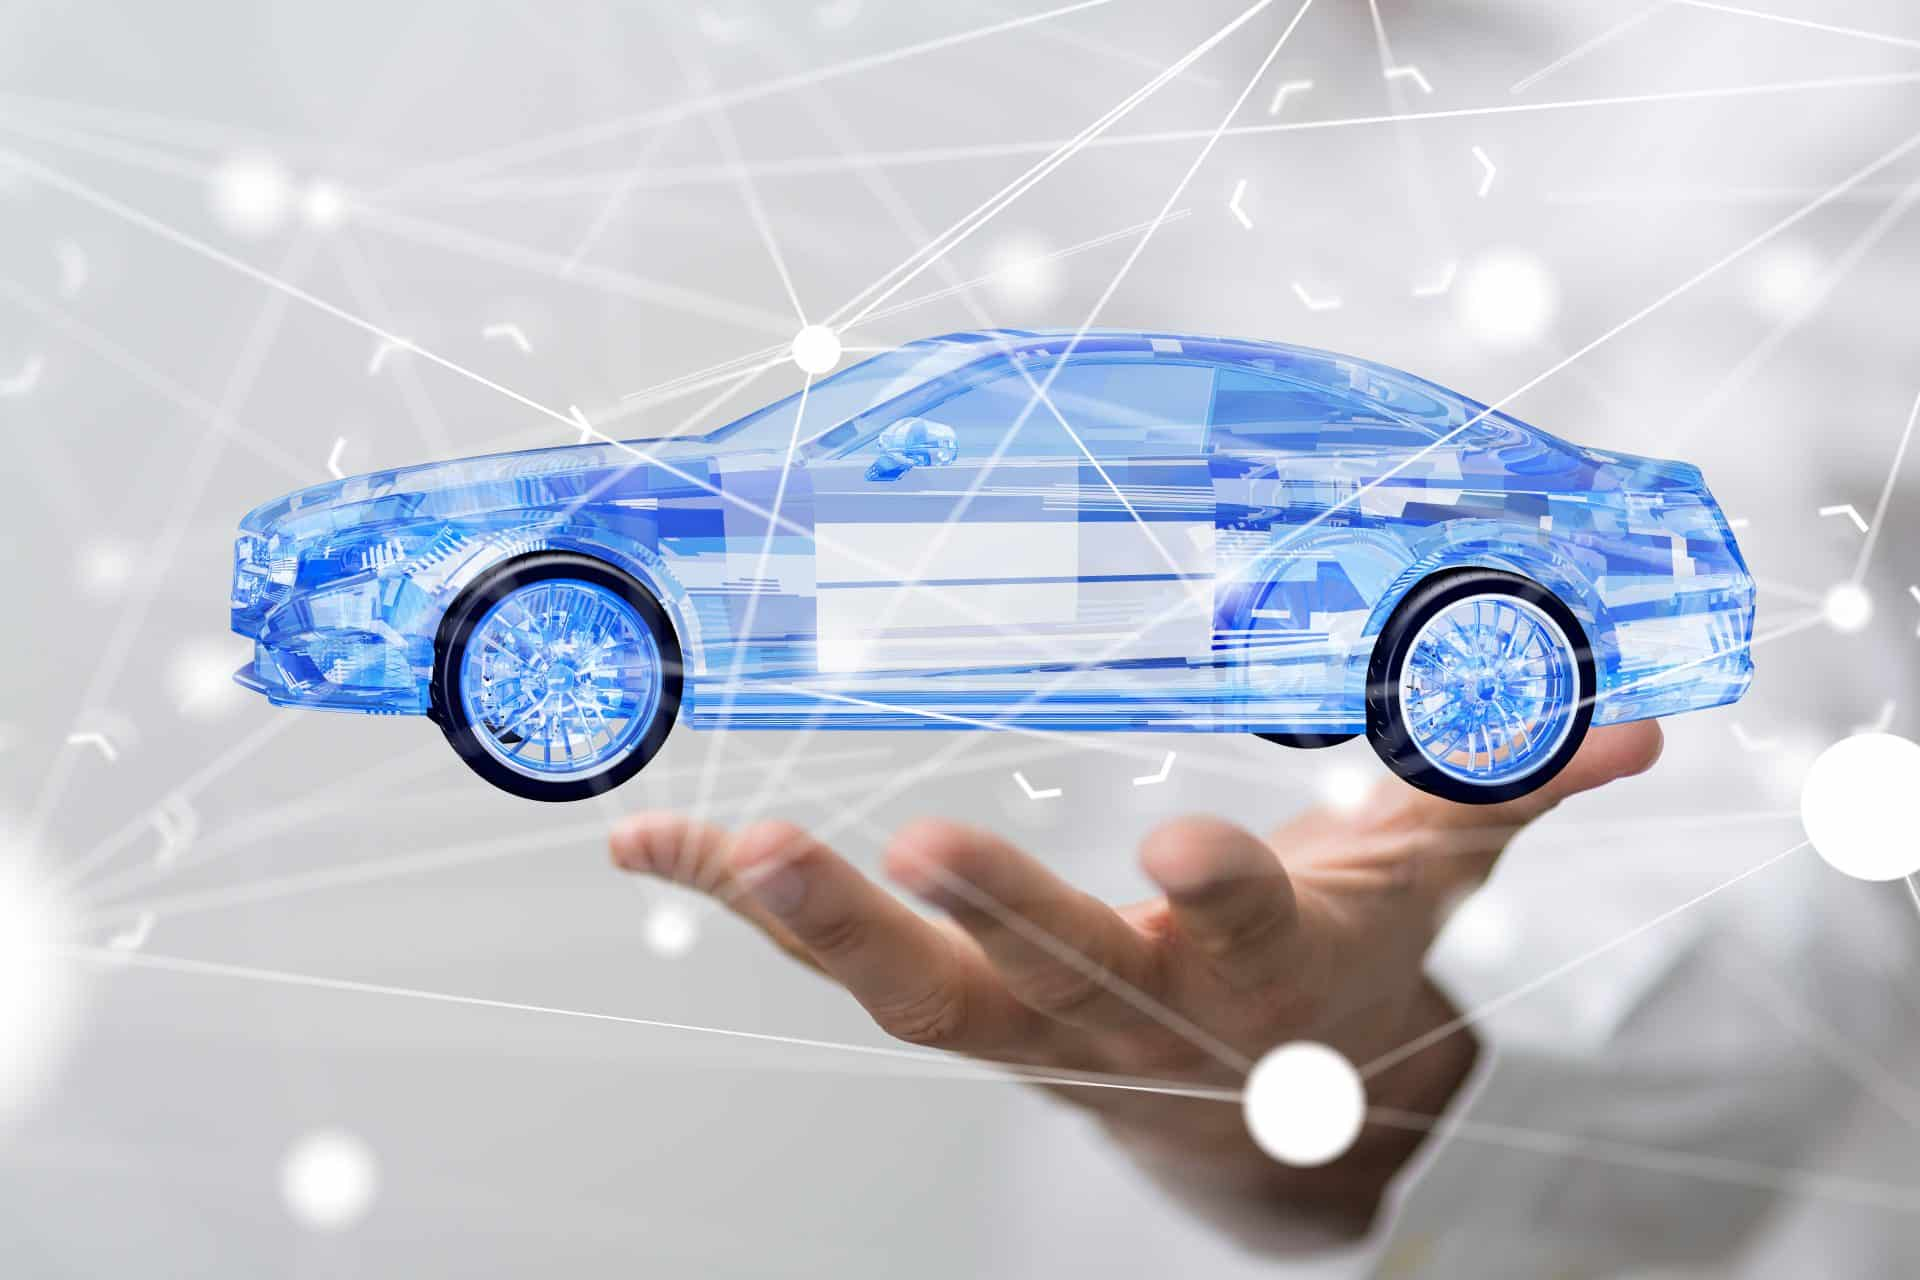 Nach Predictive Maintenance, Connected Car kommt nun die Artificial Intelligence ins Auto.